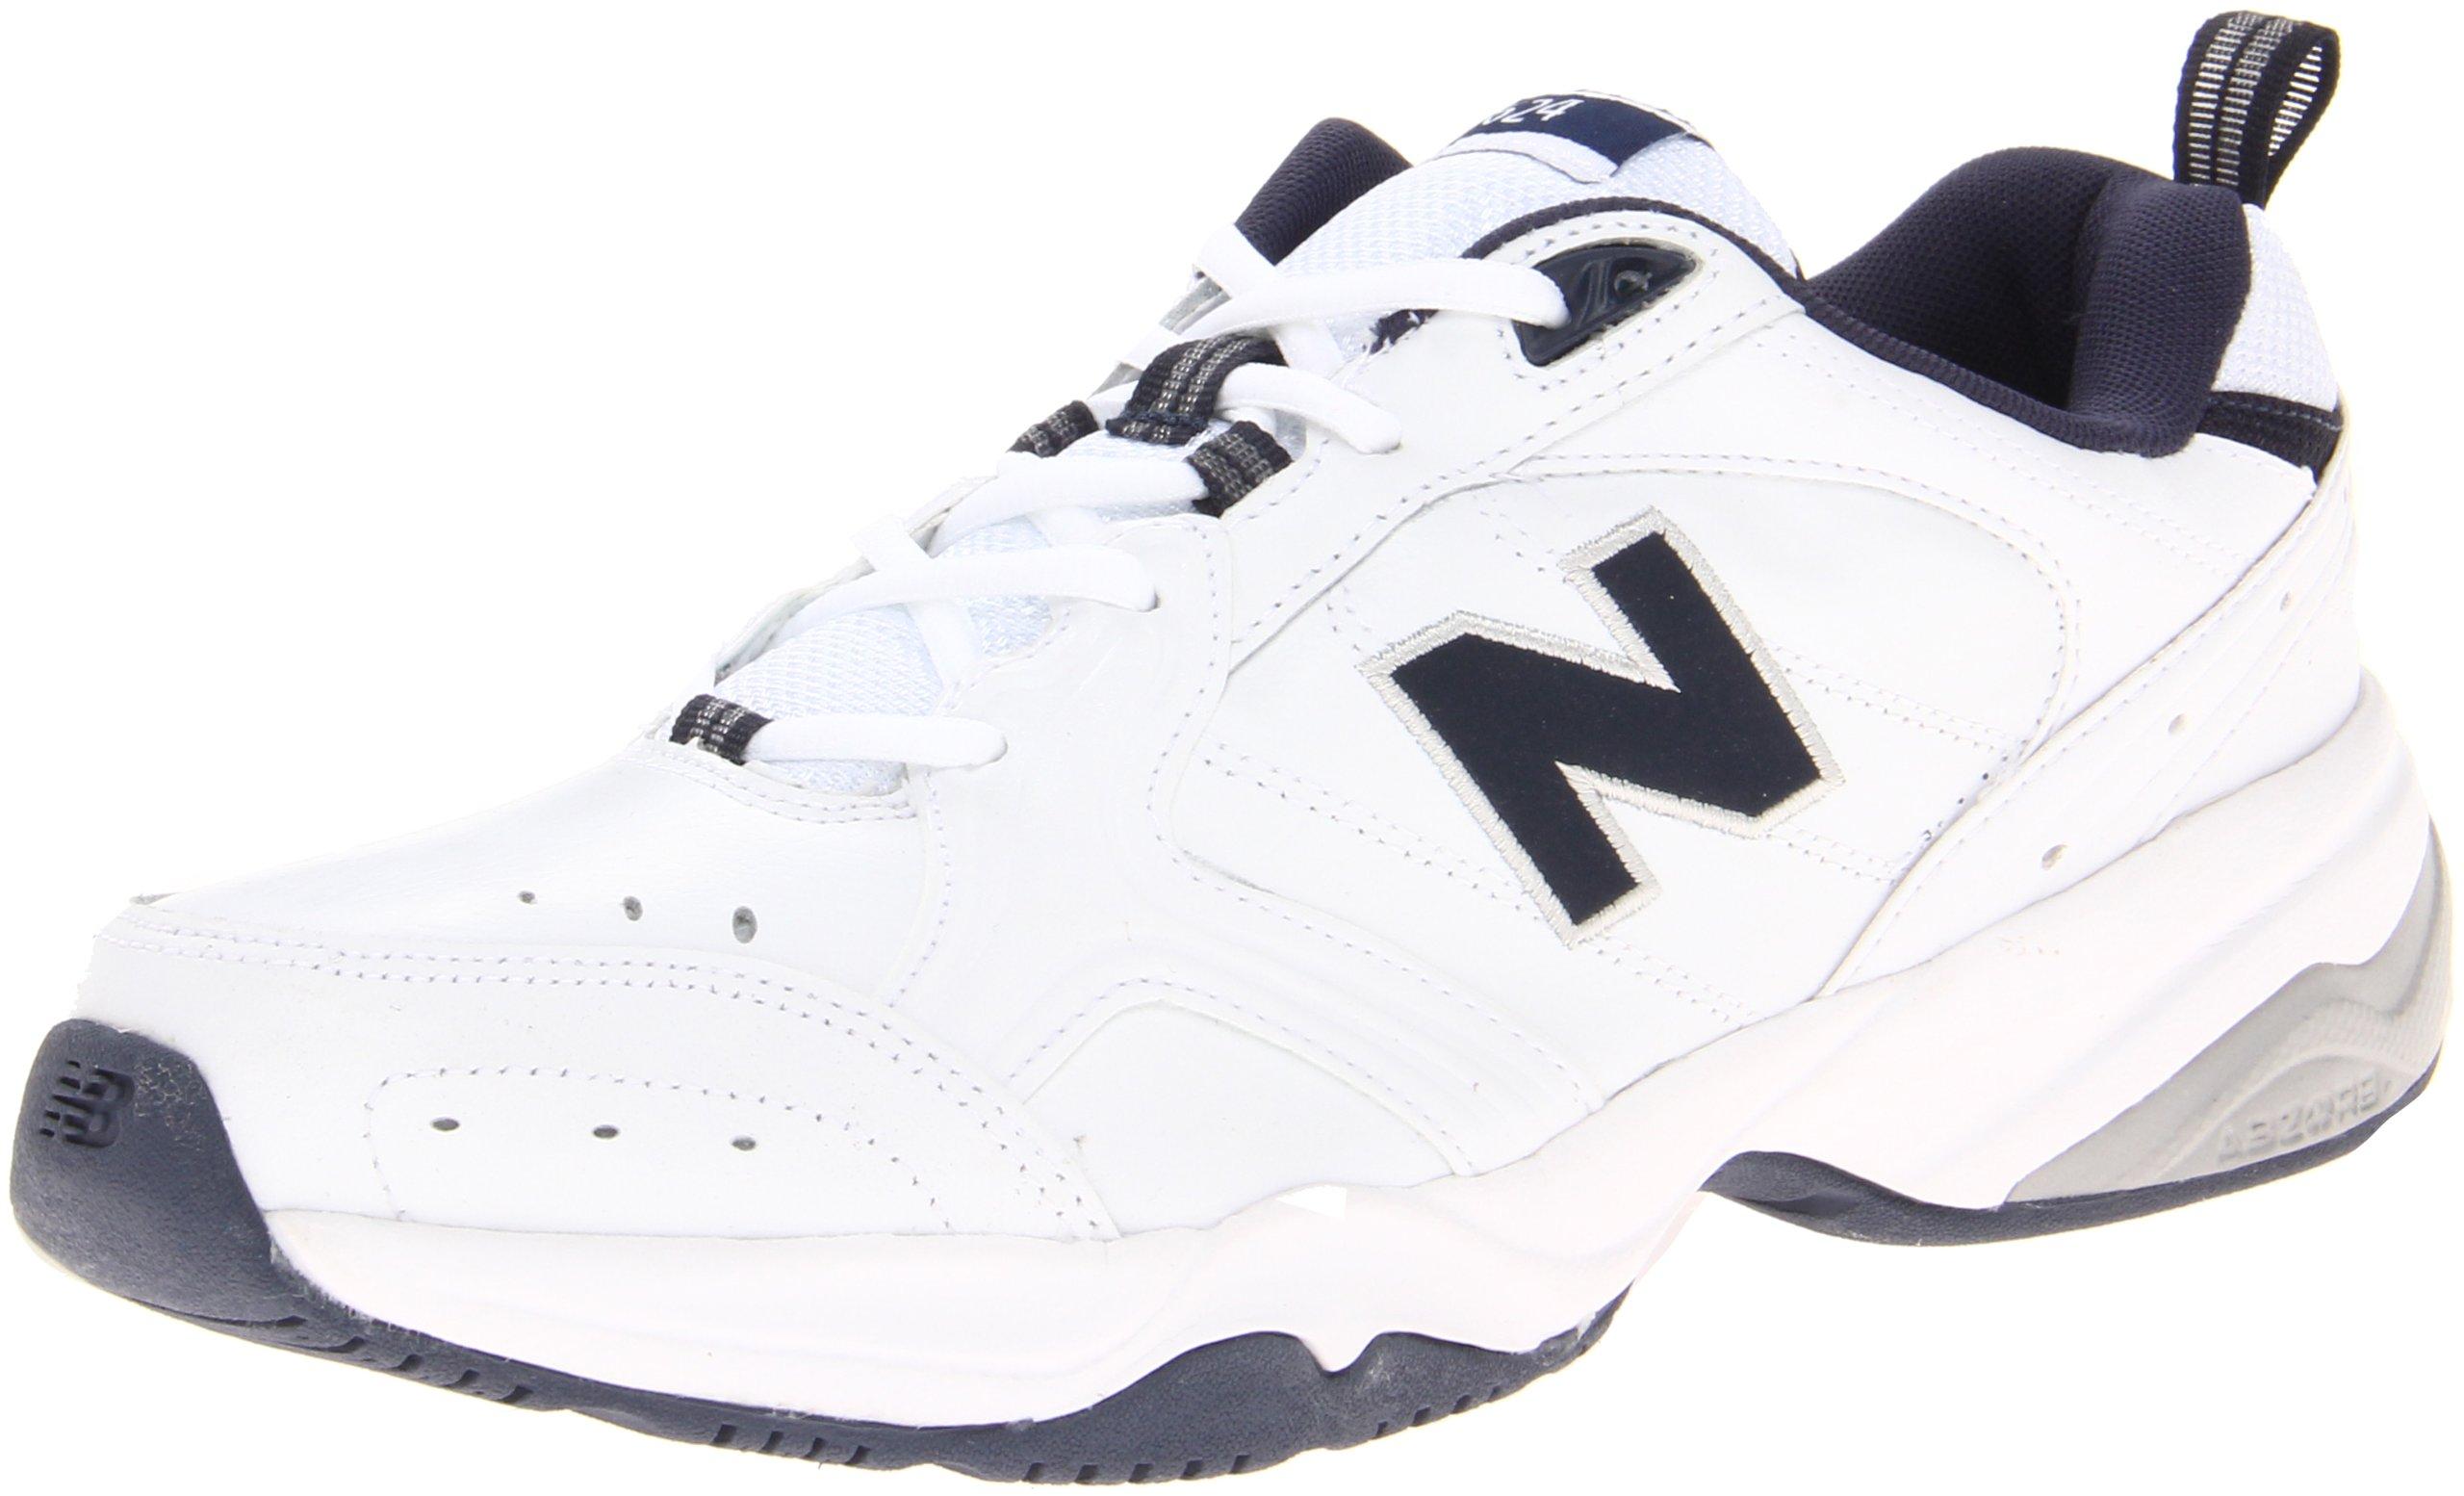 New Balance Men's MX624v2 Casual Comfort Training Shoe, White/Navy, 16 6E US by New Balance